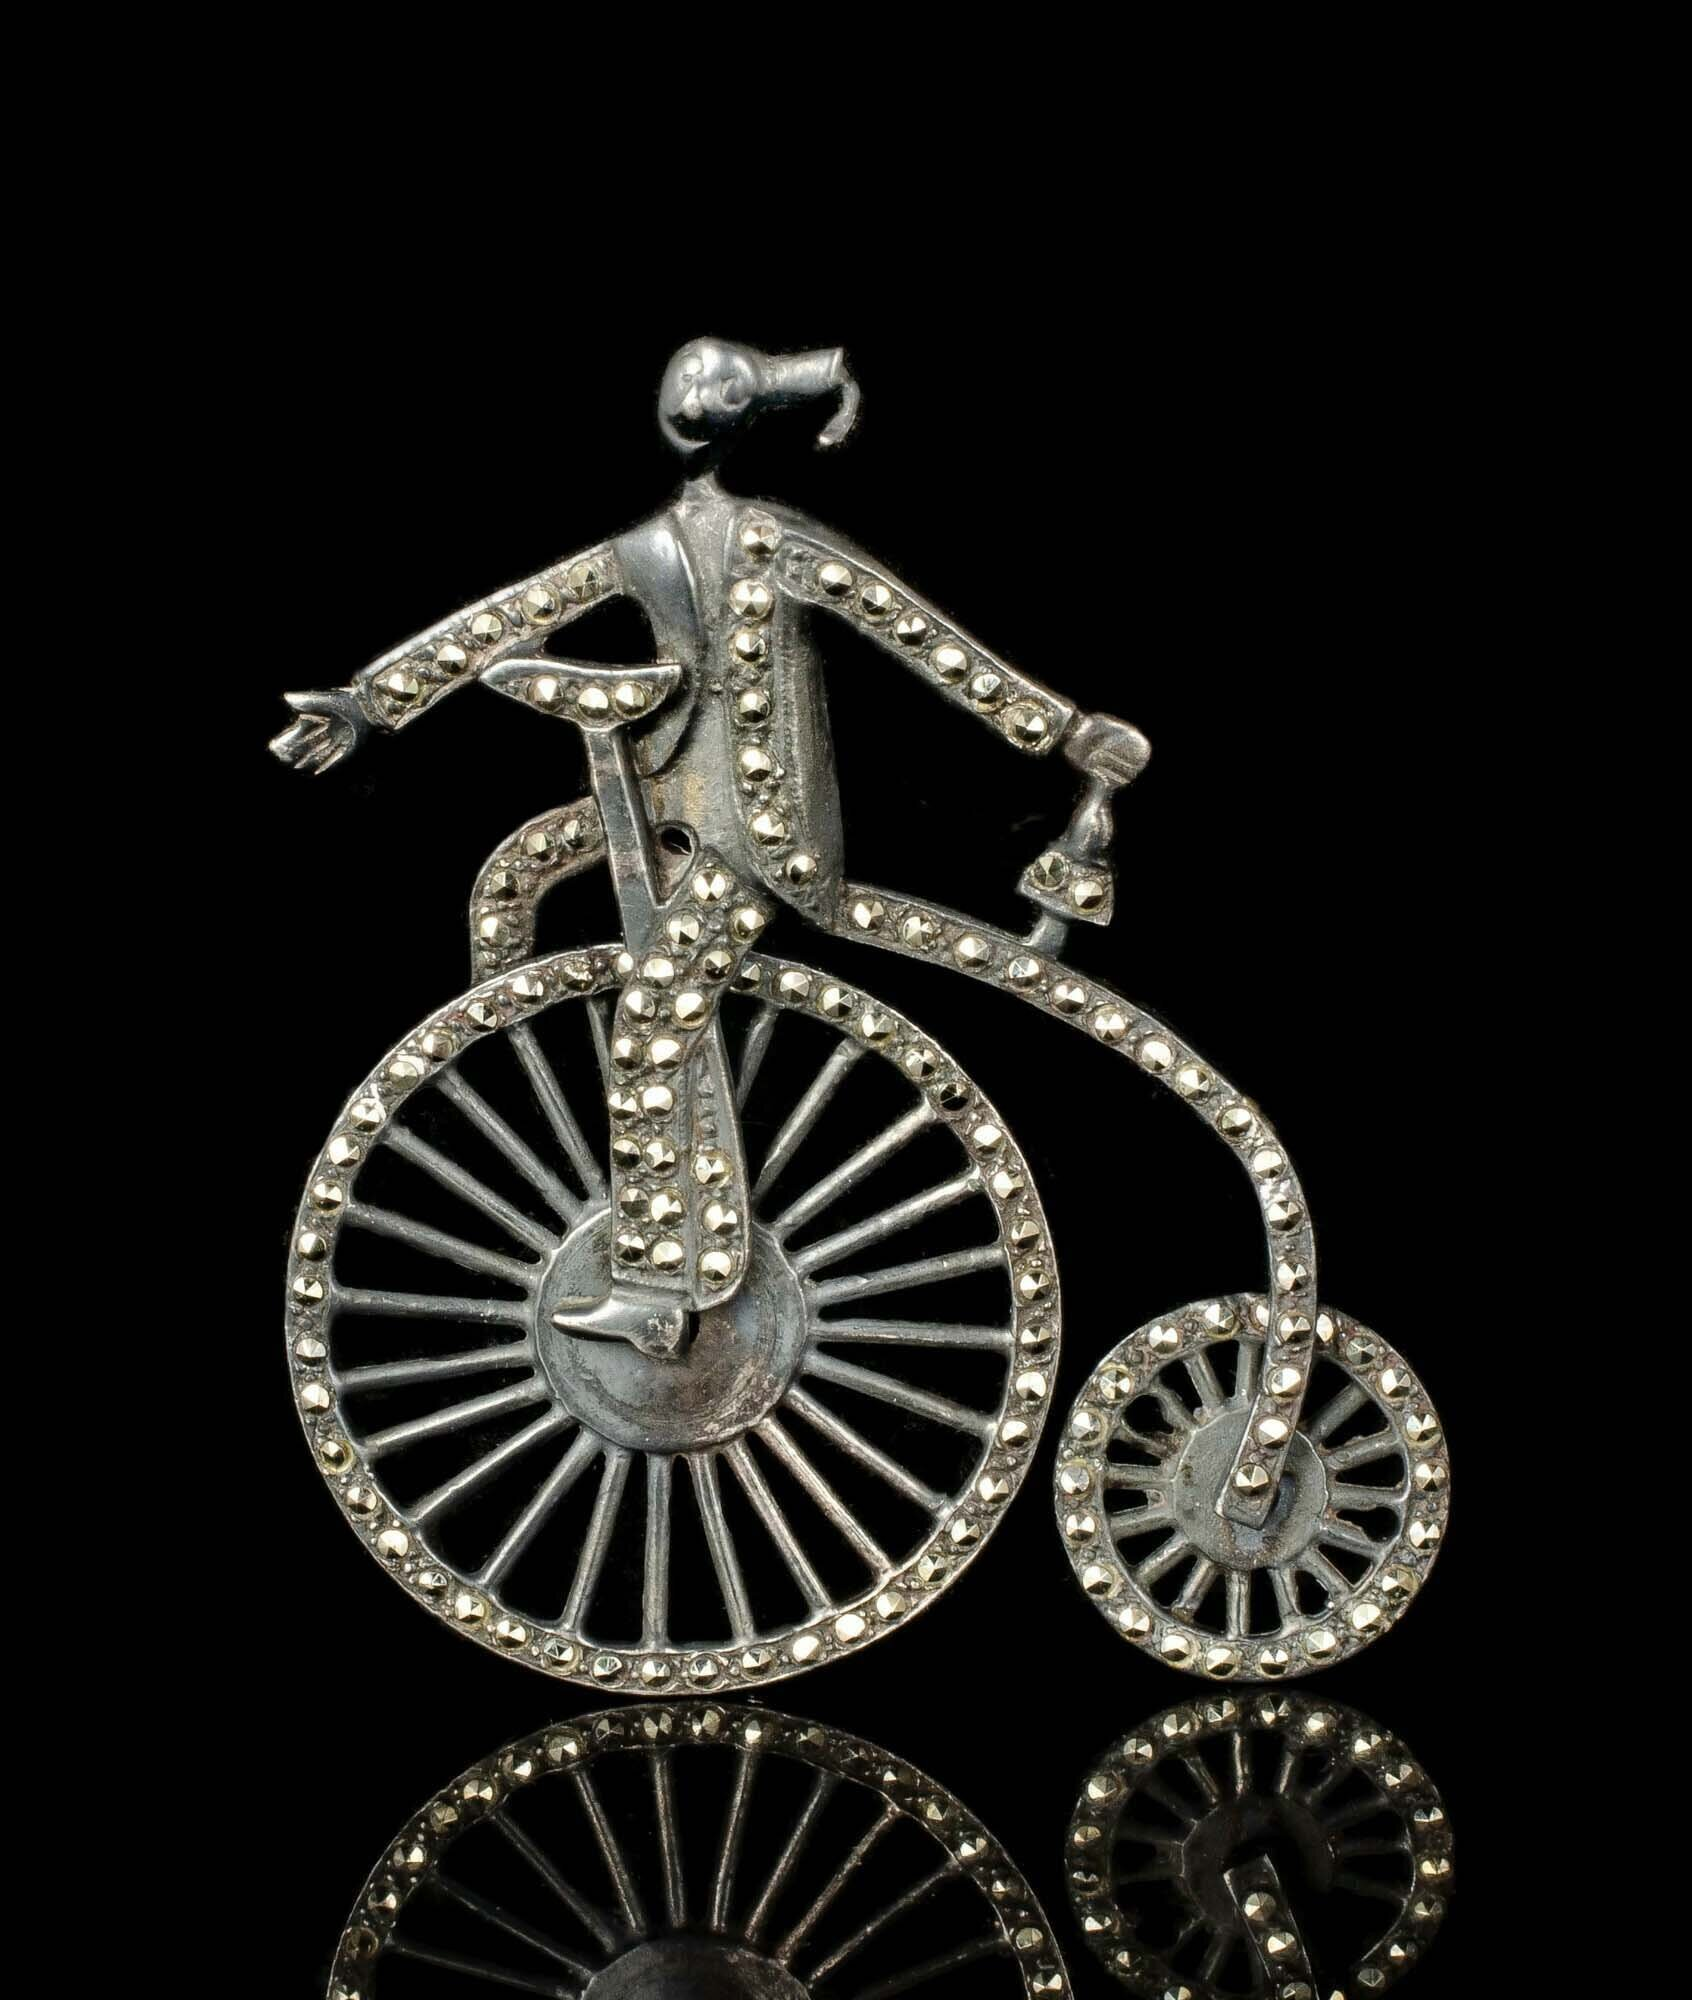 boneshakercyclistpin1.jpg